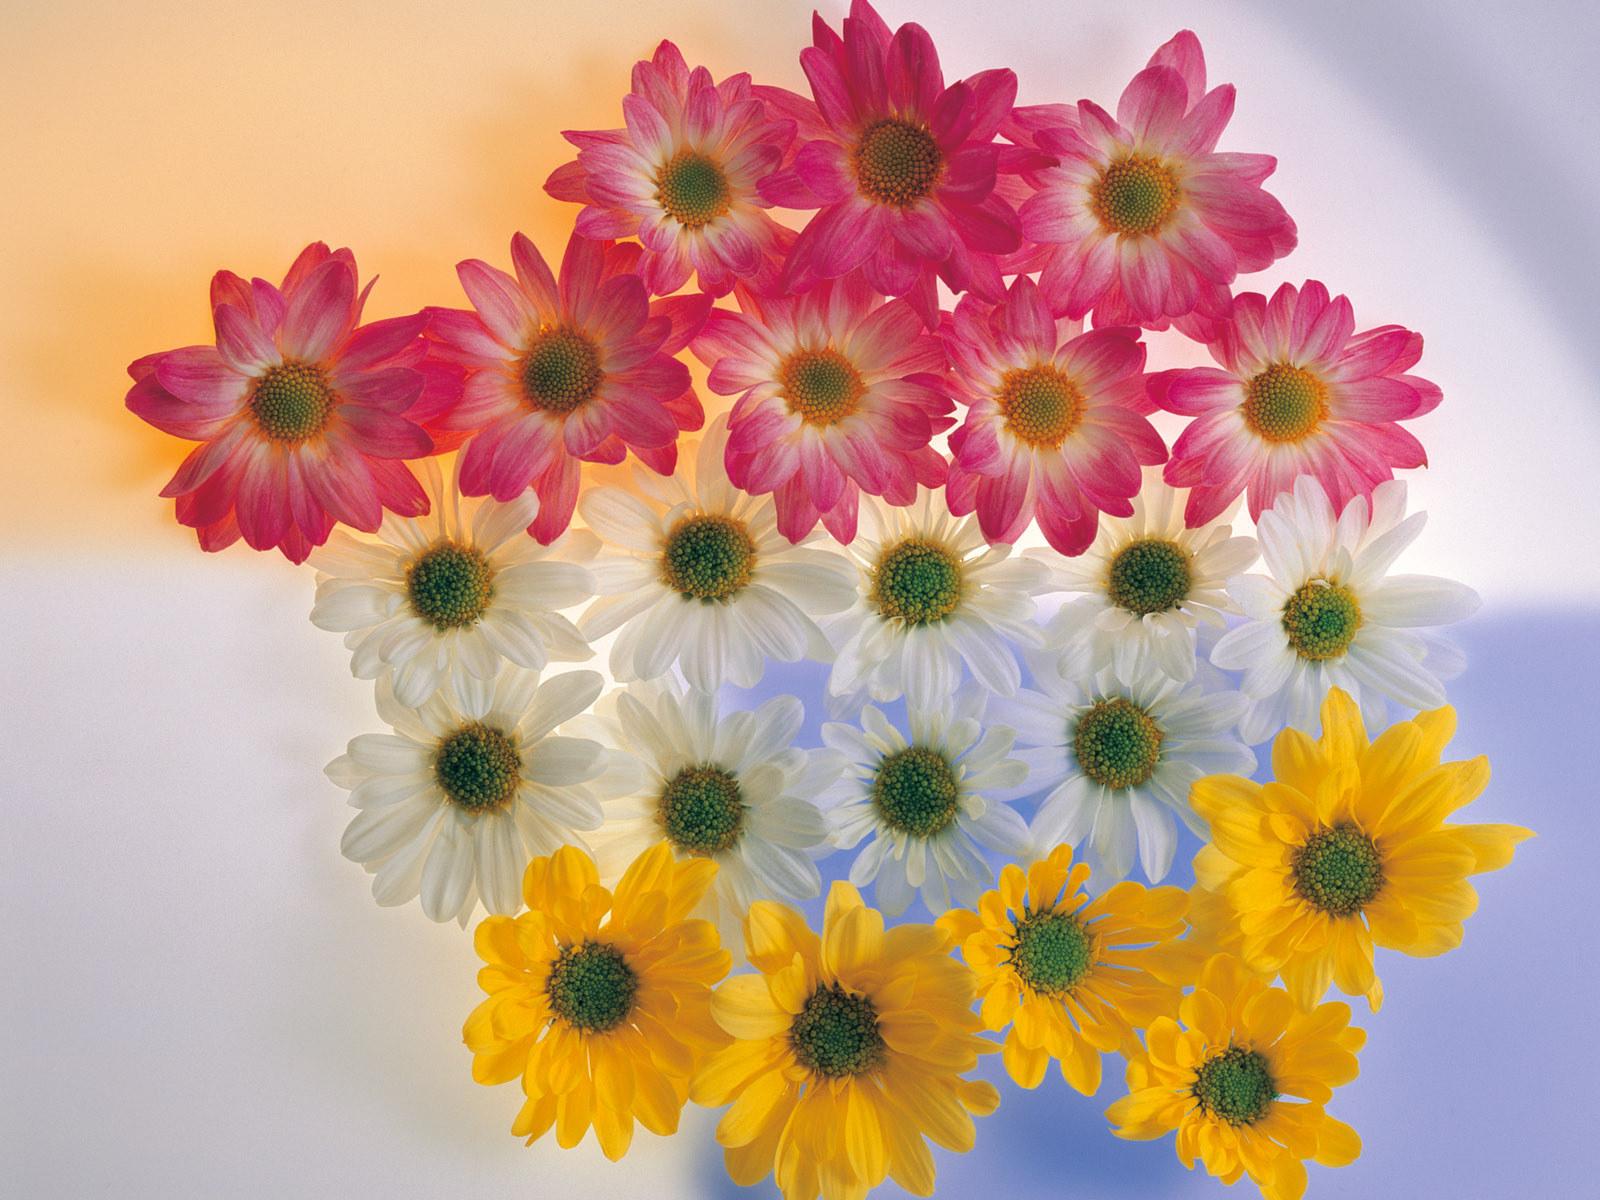 flowers for flower lovers.: Flowers wallpapers HD desktop